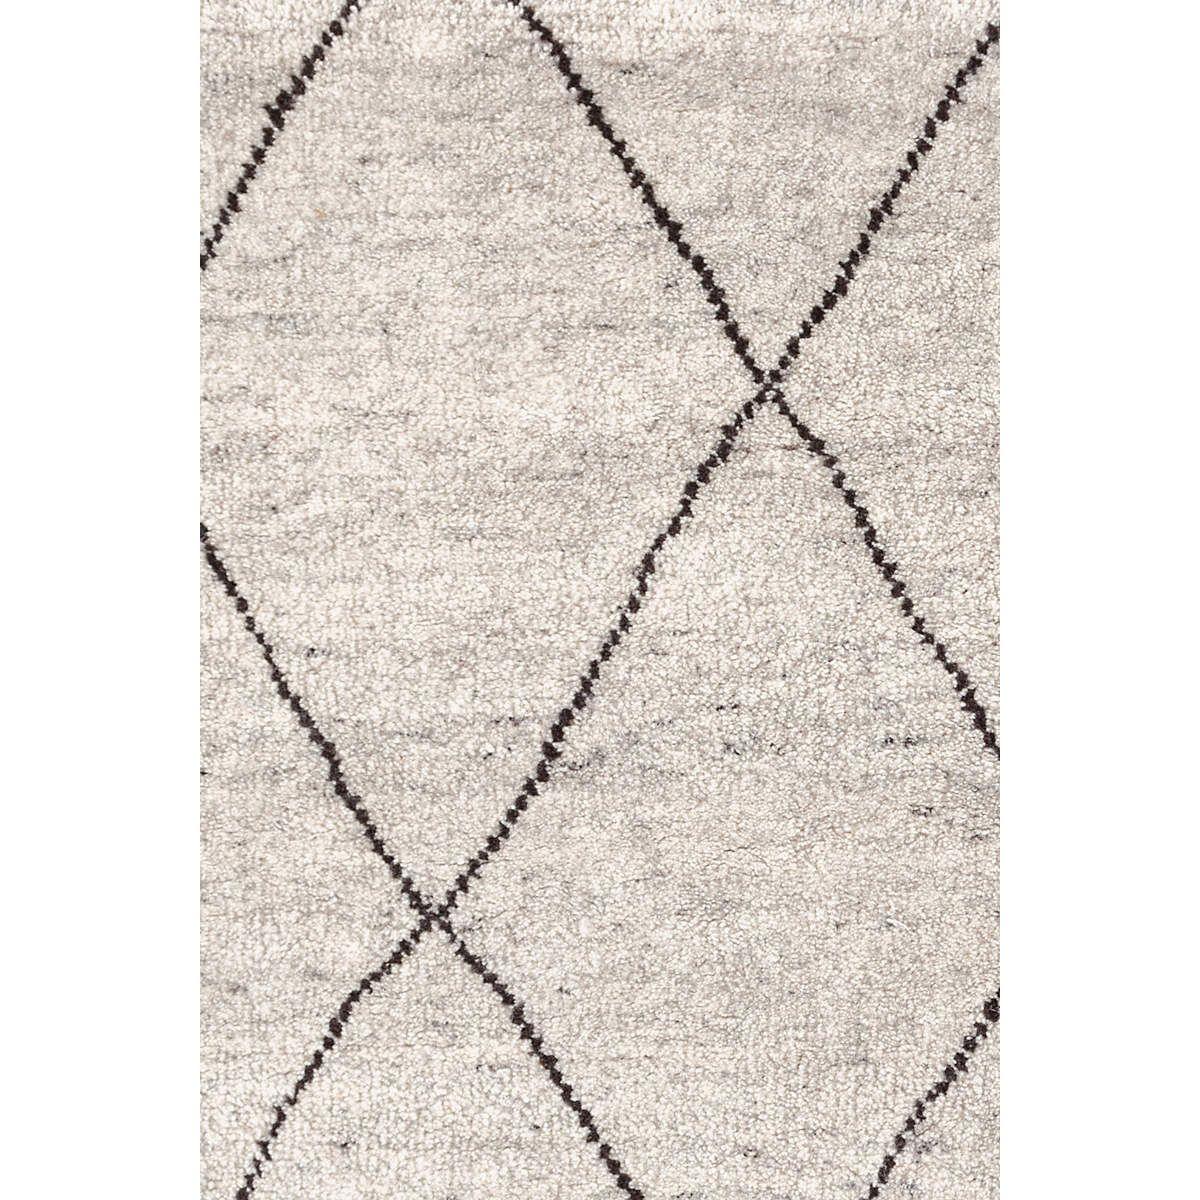 Lindelse Rug High Pile Natural Beige 5 7 X7 10 Ikea Rugs On Carpet Rugs Ikea Rug